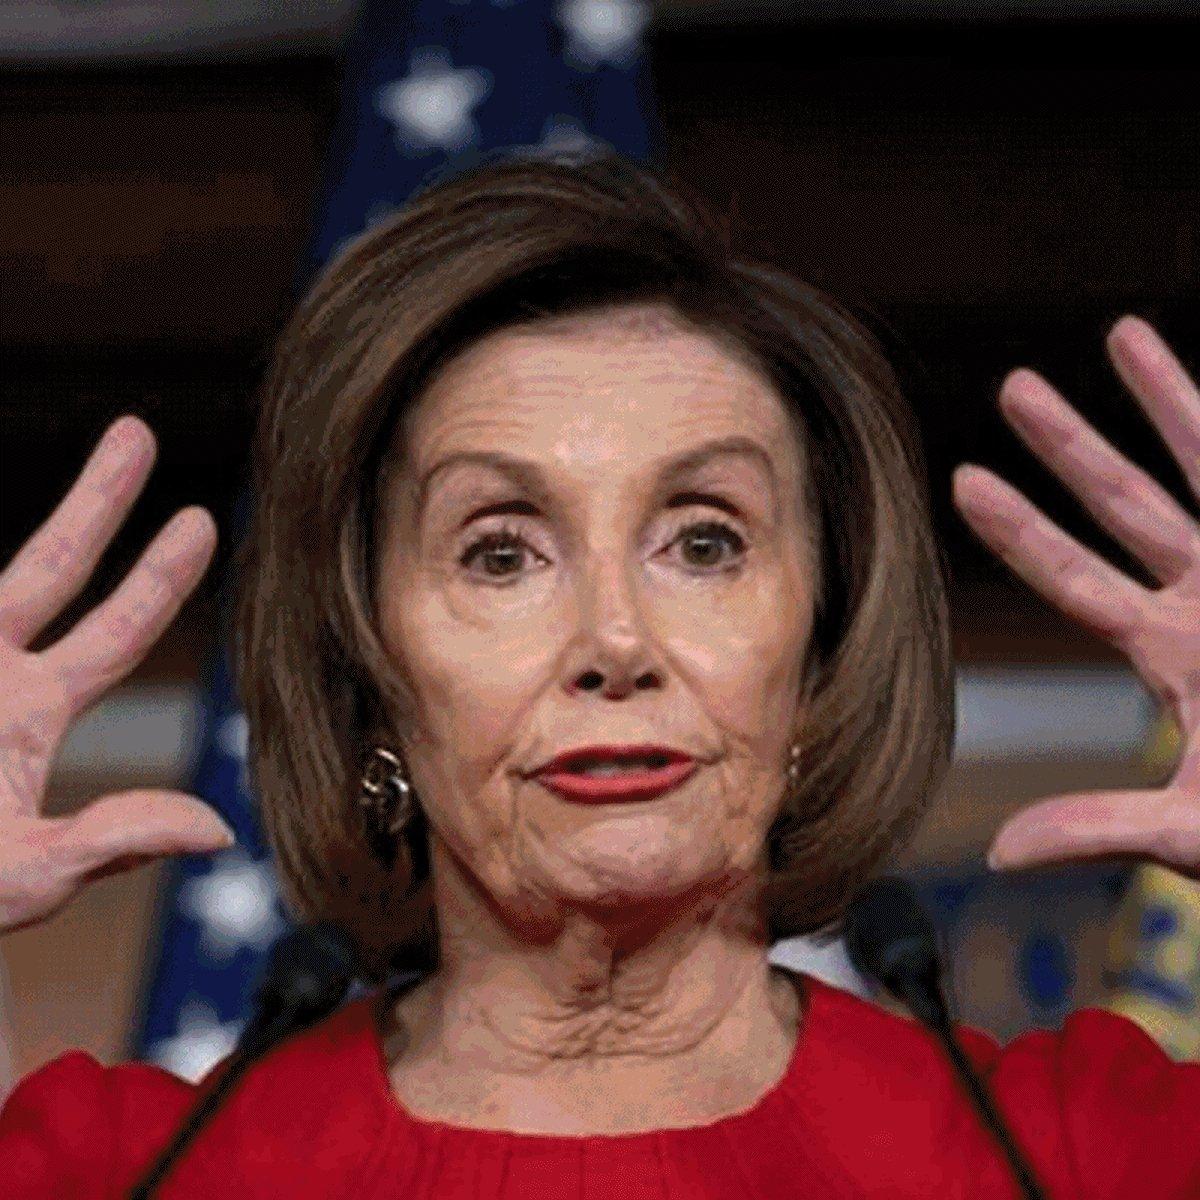 #Marge #TuckerCarlsonIsABigot  #Batwoman #BehindHerEyes #cosplay  #druck #dream #ENVtuber #earthquake #EndSARS #HWASA  #inspiration #JIMIN #LOONA #ONEPIECE #Accused #quotes #royalehightrading #COVID19 The House should vote AGAINST Nancy Pelosi's radical abortion agenda! Catholic?